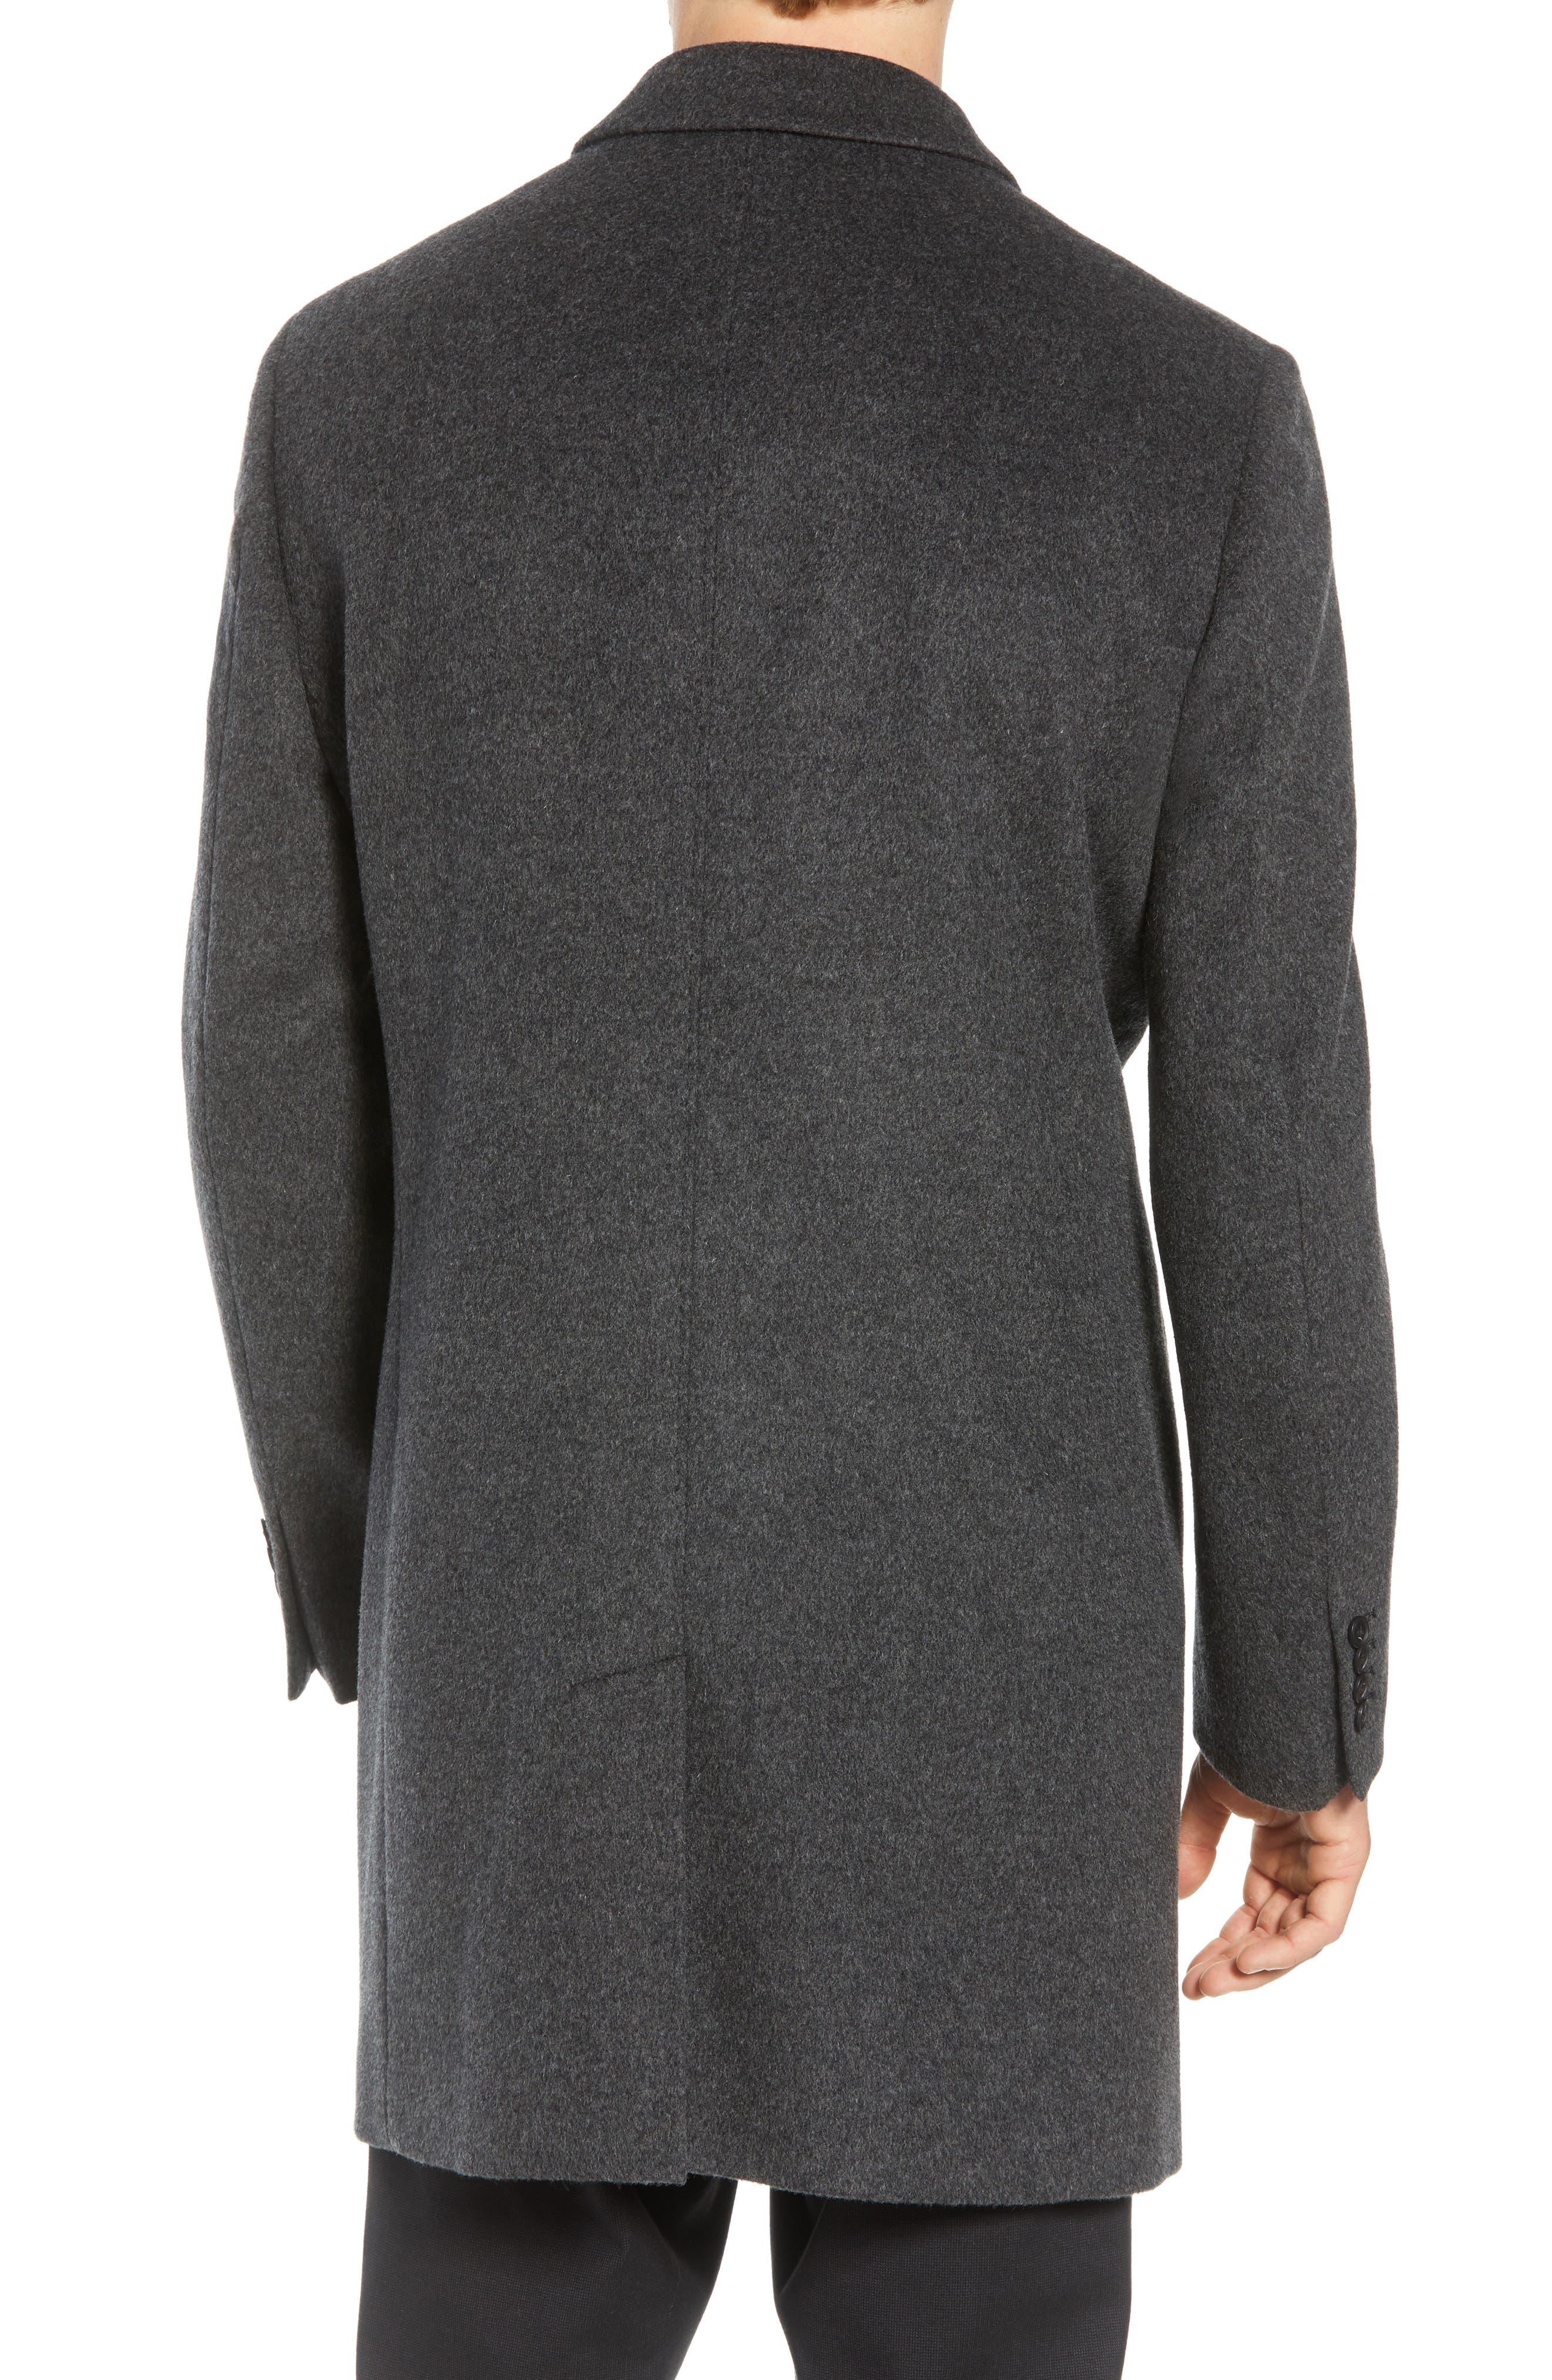 Mason Wool & Cashmere Overcoat,                             Alternate thumbnail 2, color,                             CHARCOAL